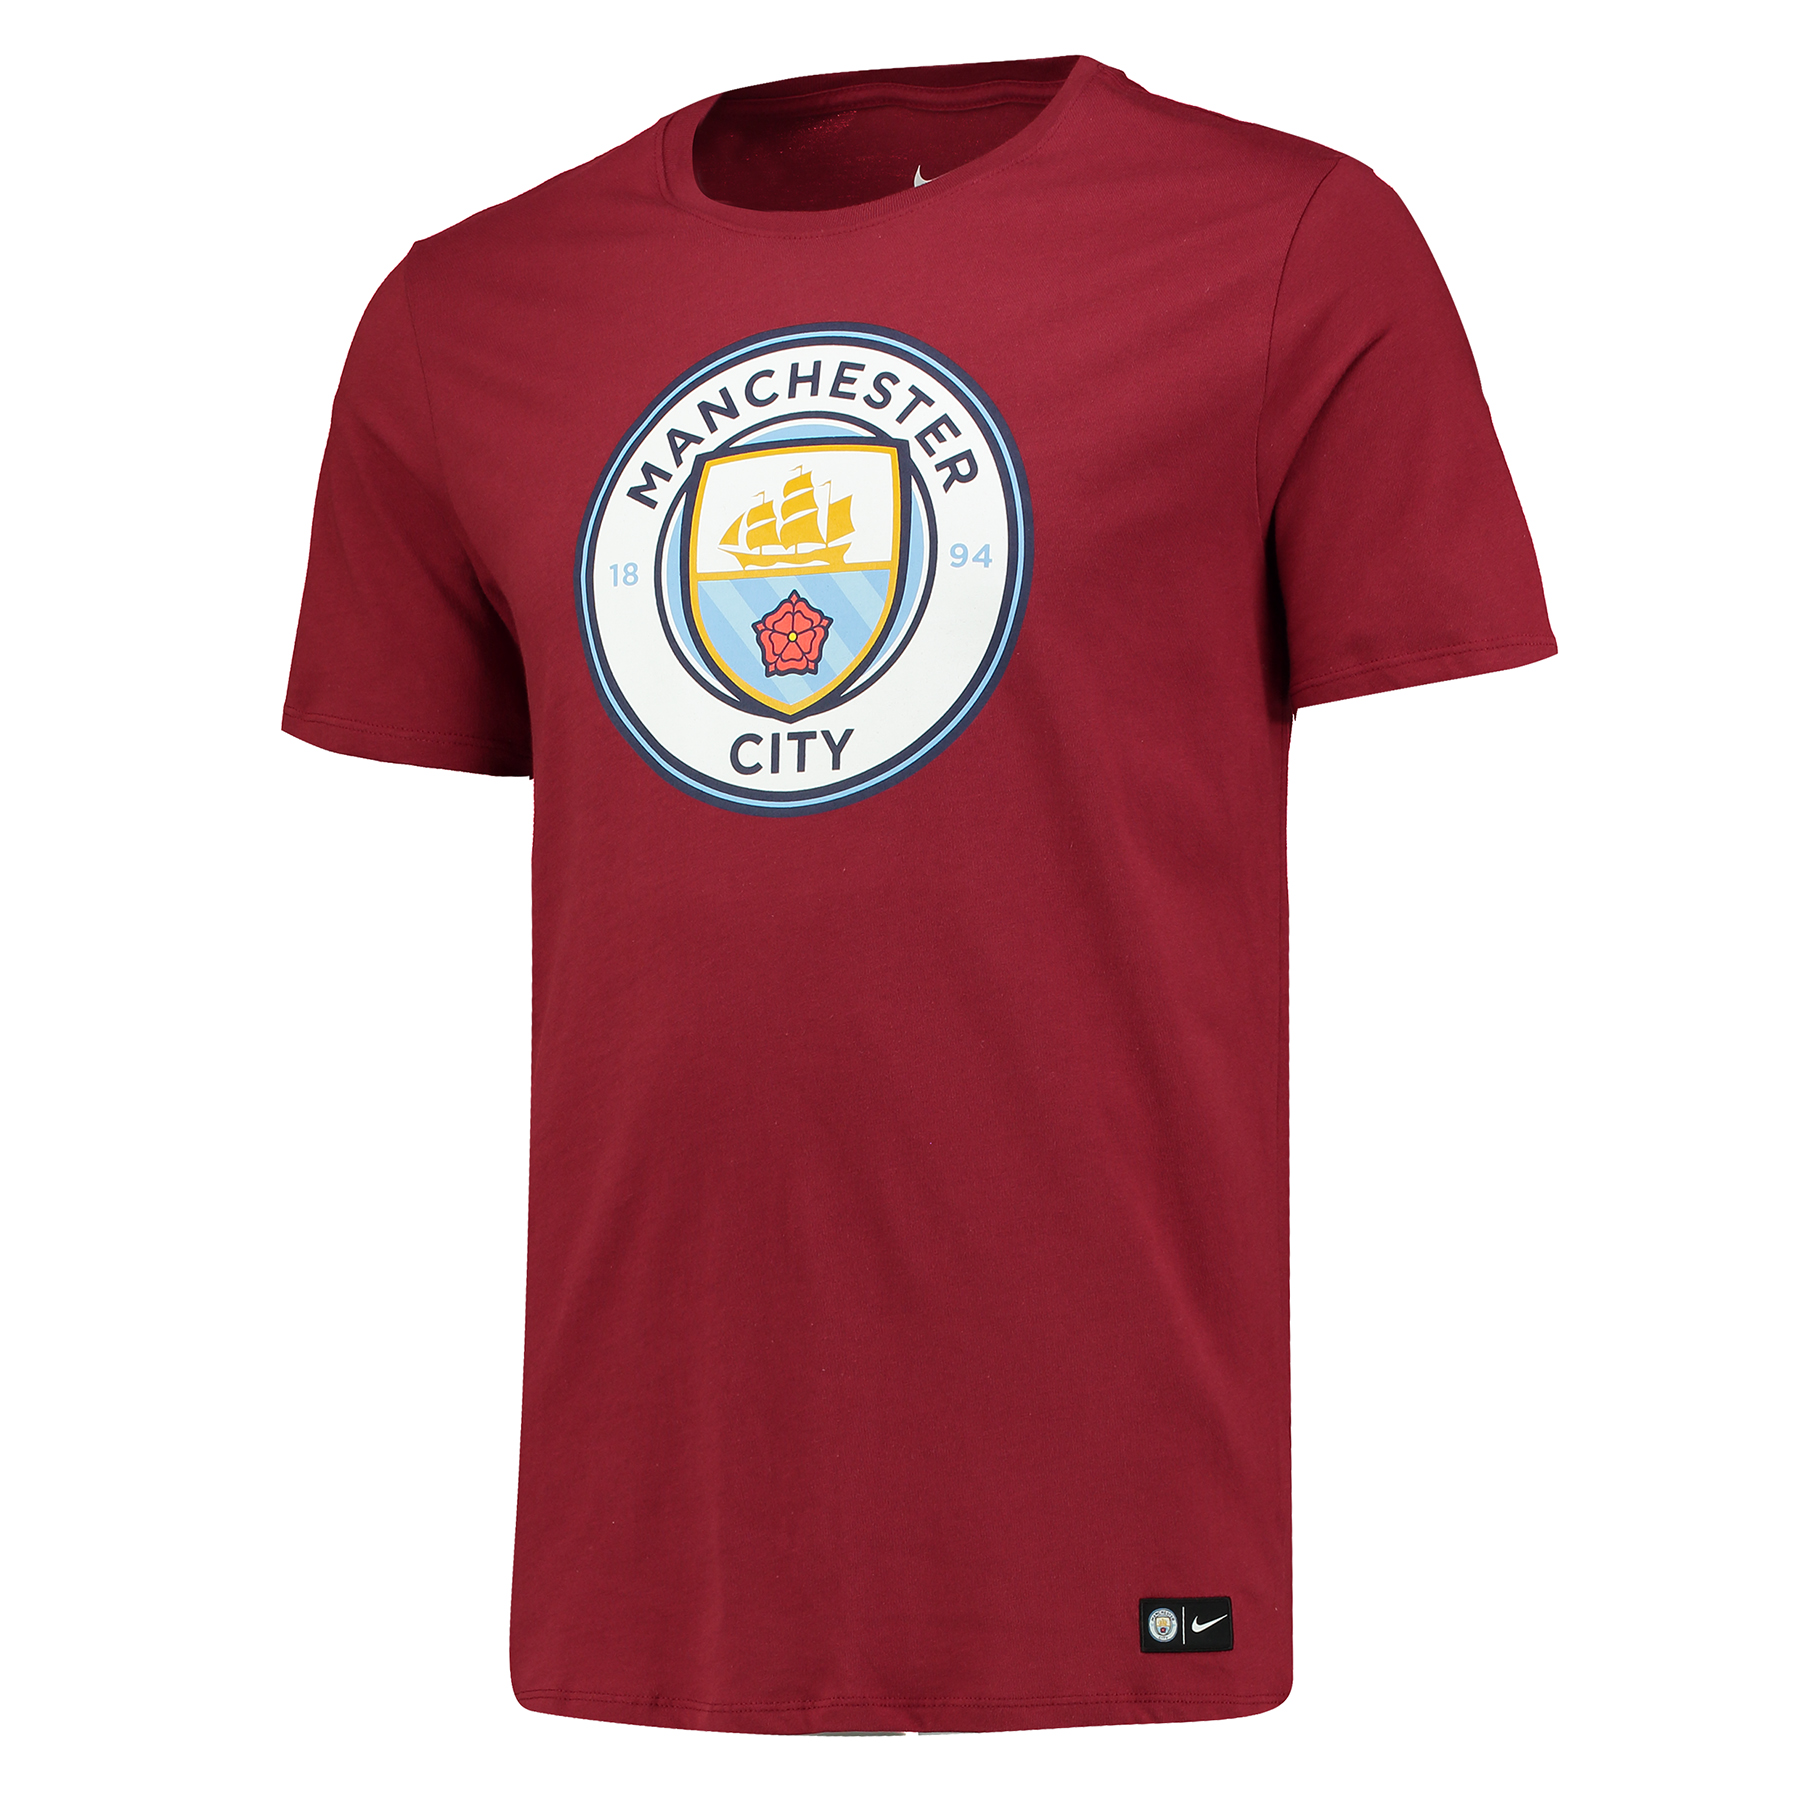 Manchester City Crest T-Shirt - Maroon